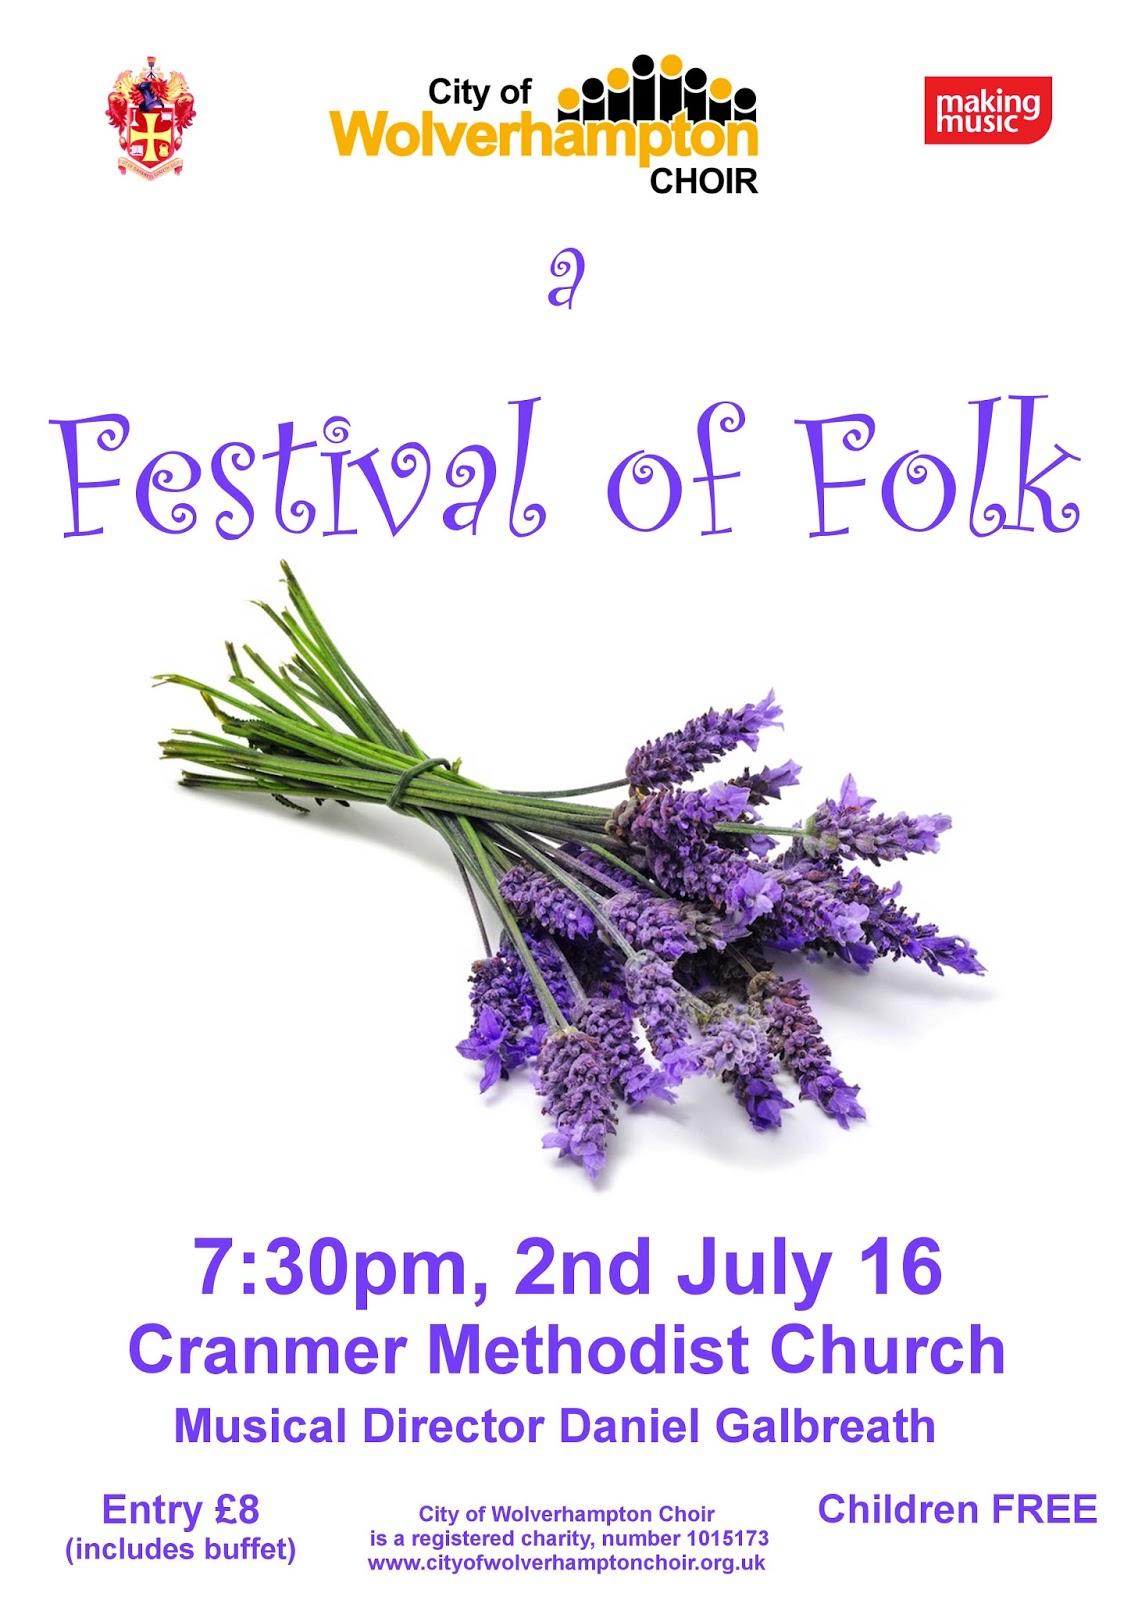 St. John's Folk Choir - St. John's Folk Choir